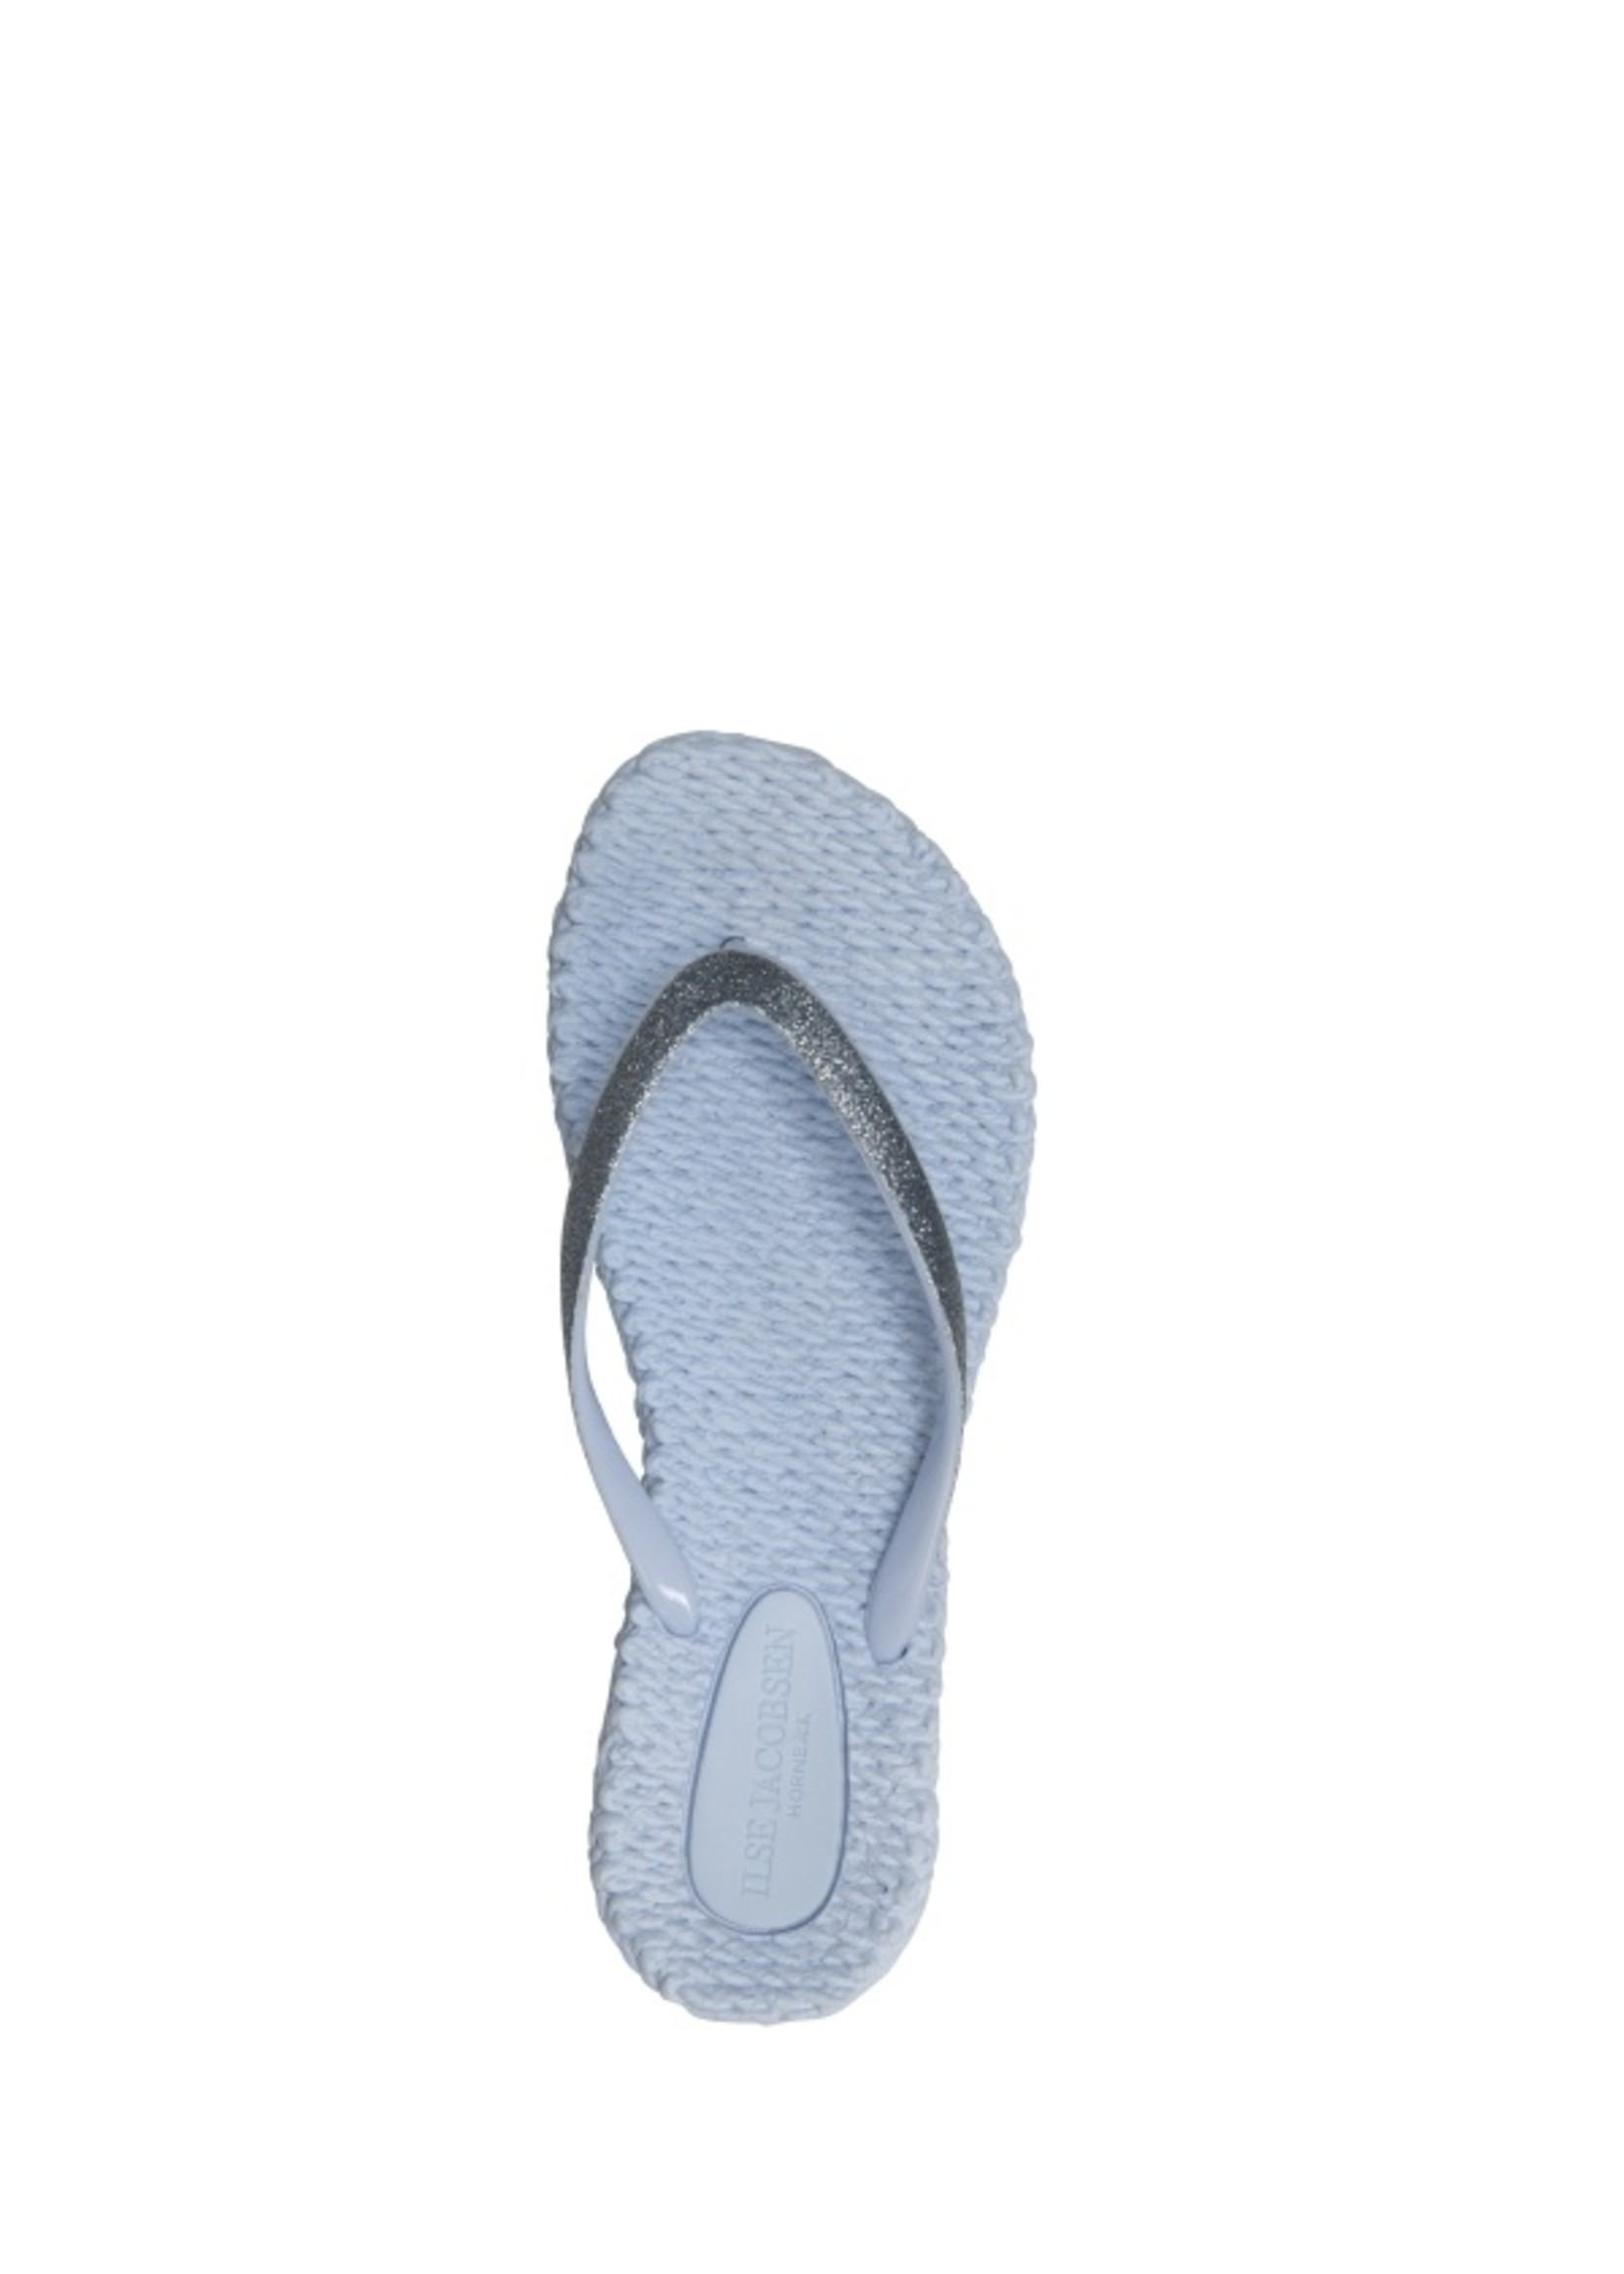 Ilse Jacobsen Cheerful Flip Flop - Bluebell 37